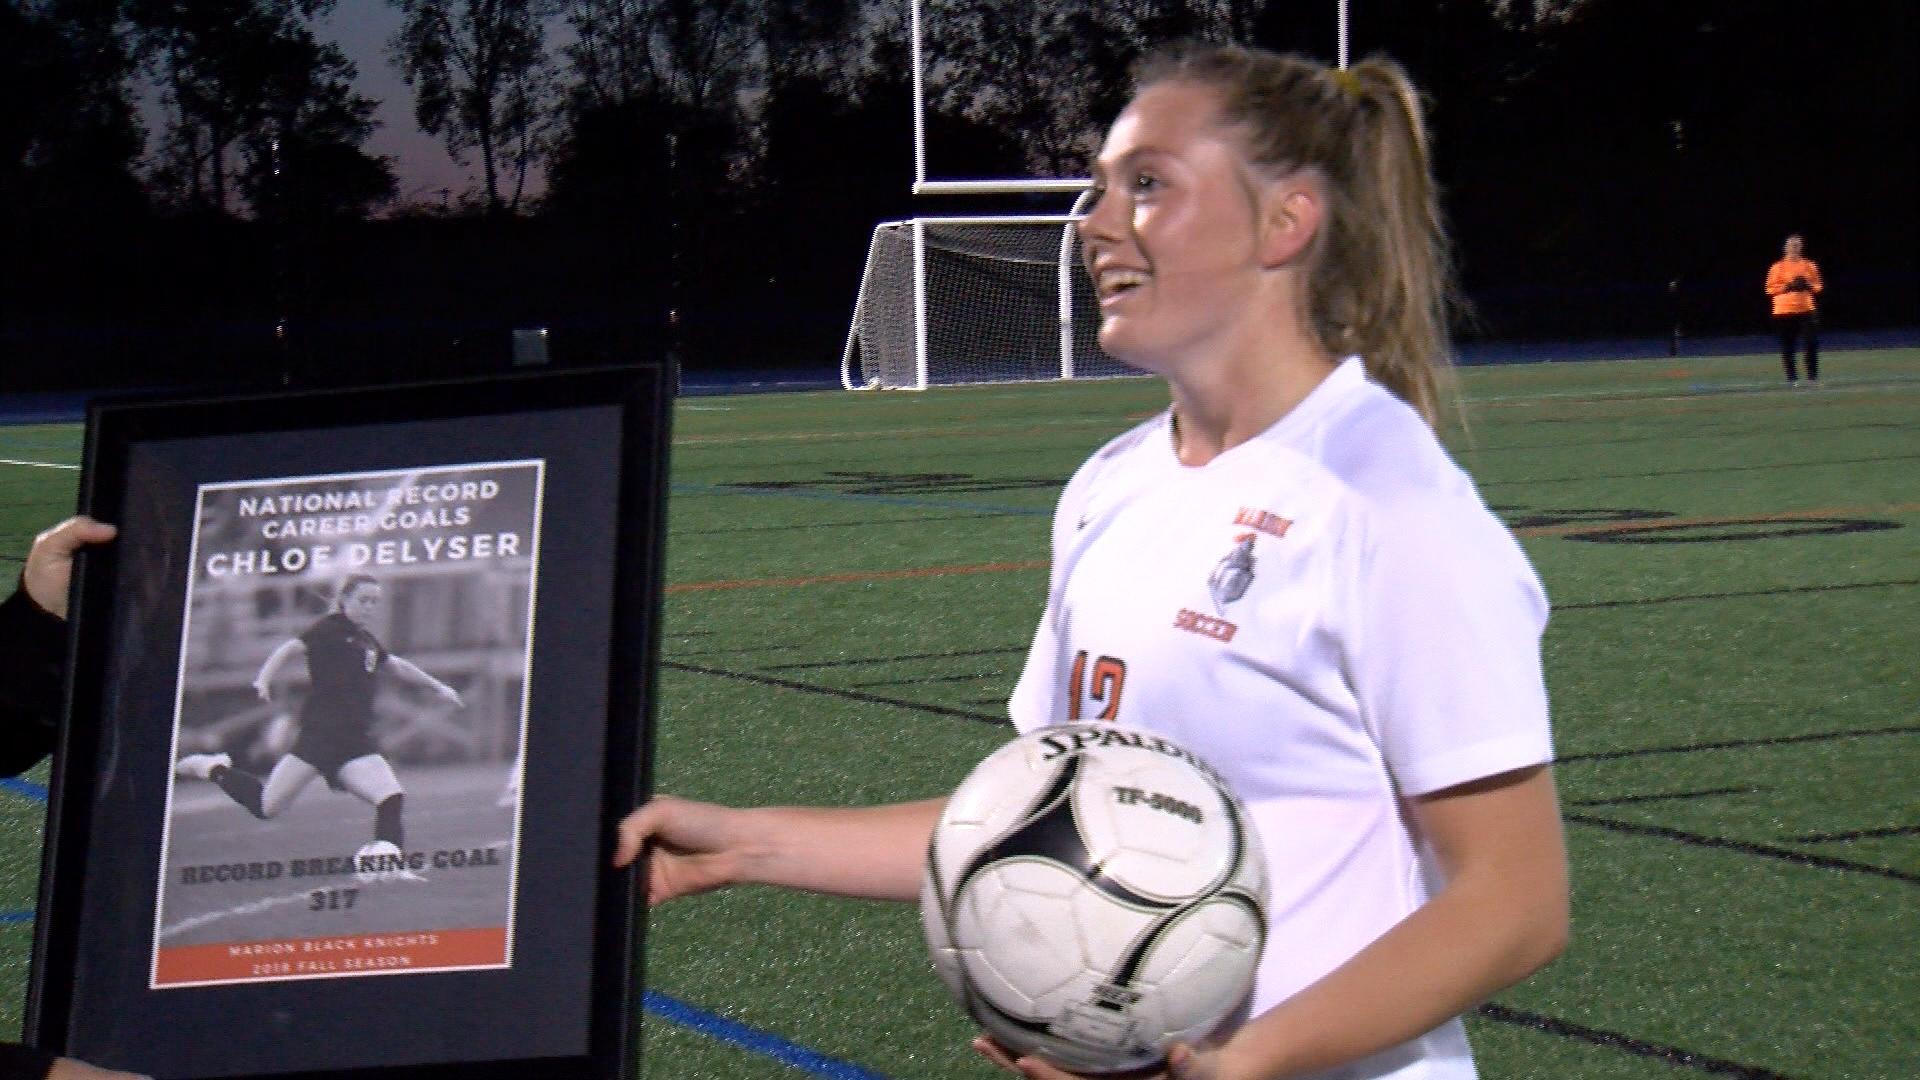 DeLyser of Marion sets U.S. girls soccer career scoring record